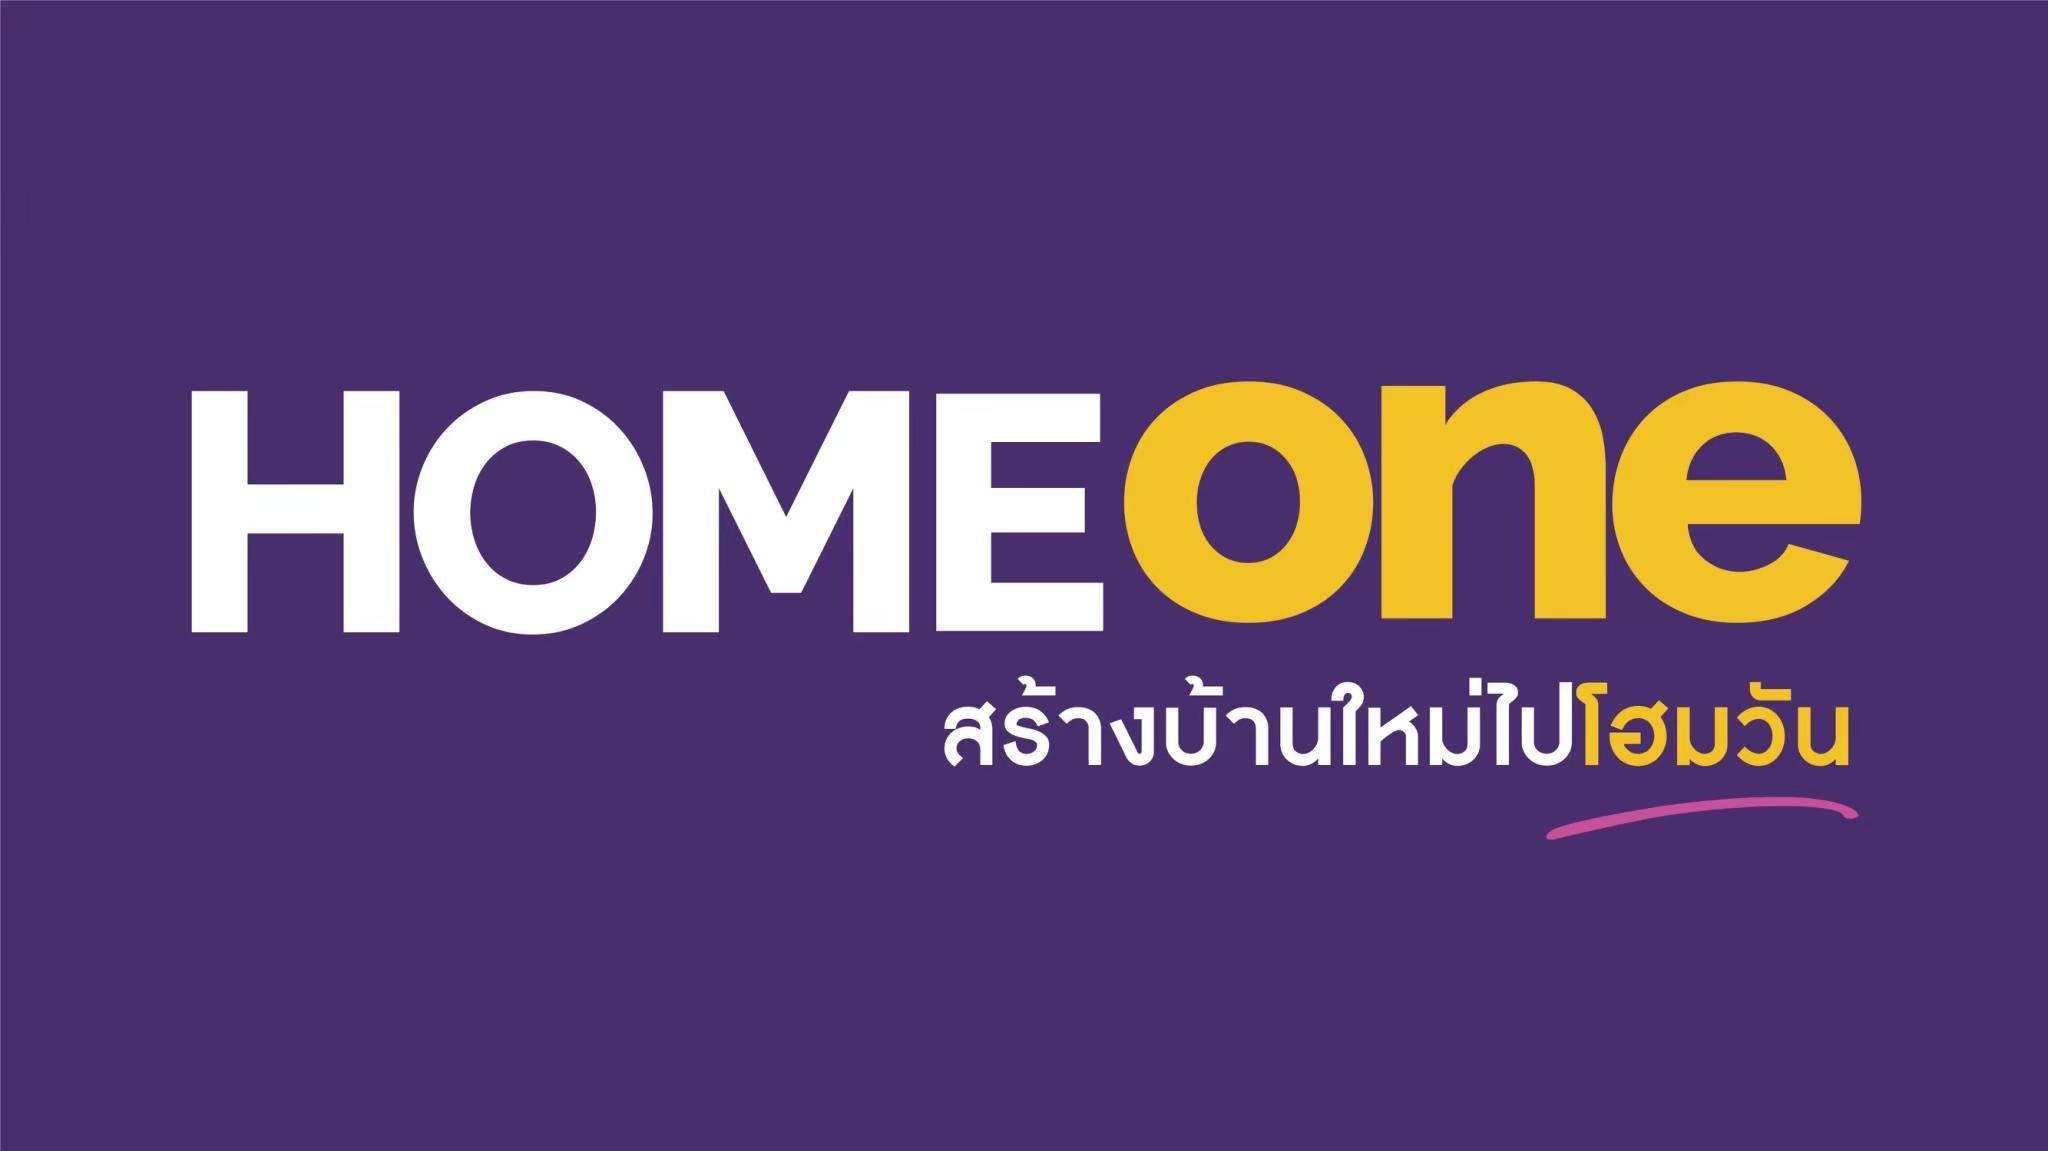 Homeone โฮมวัน